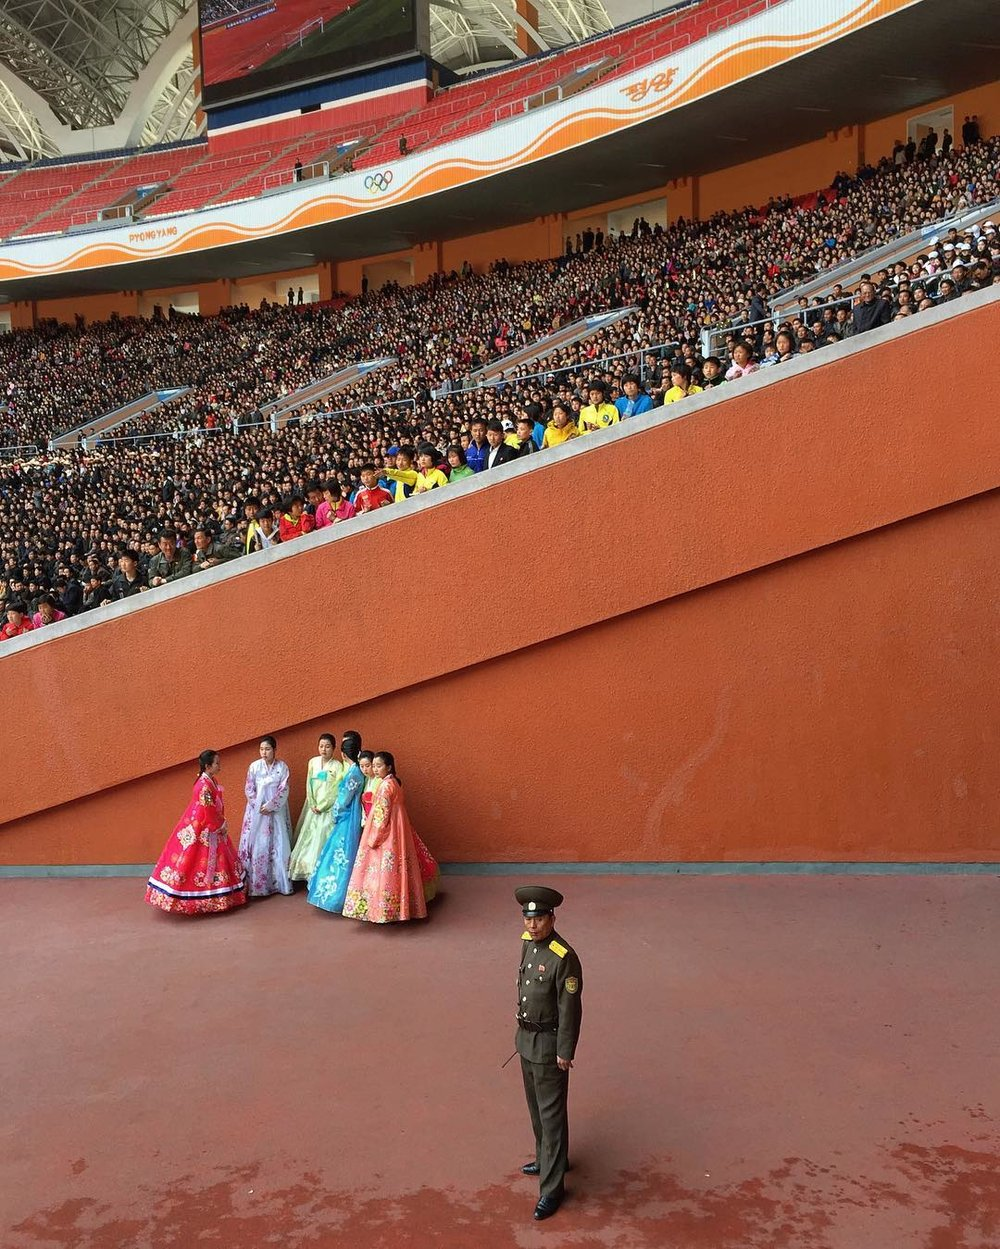 Rungrado 1st of May Stadium, Pyongyang, DPRK